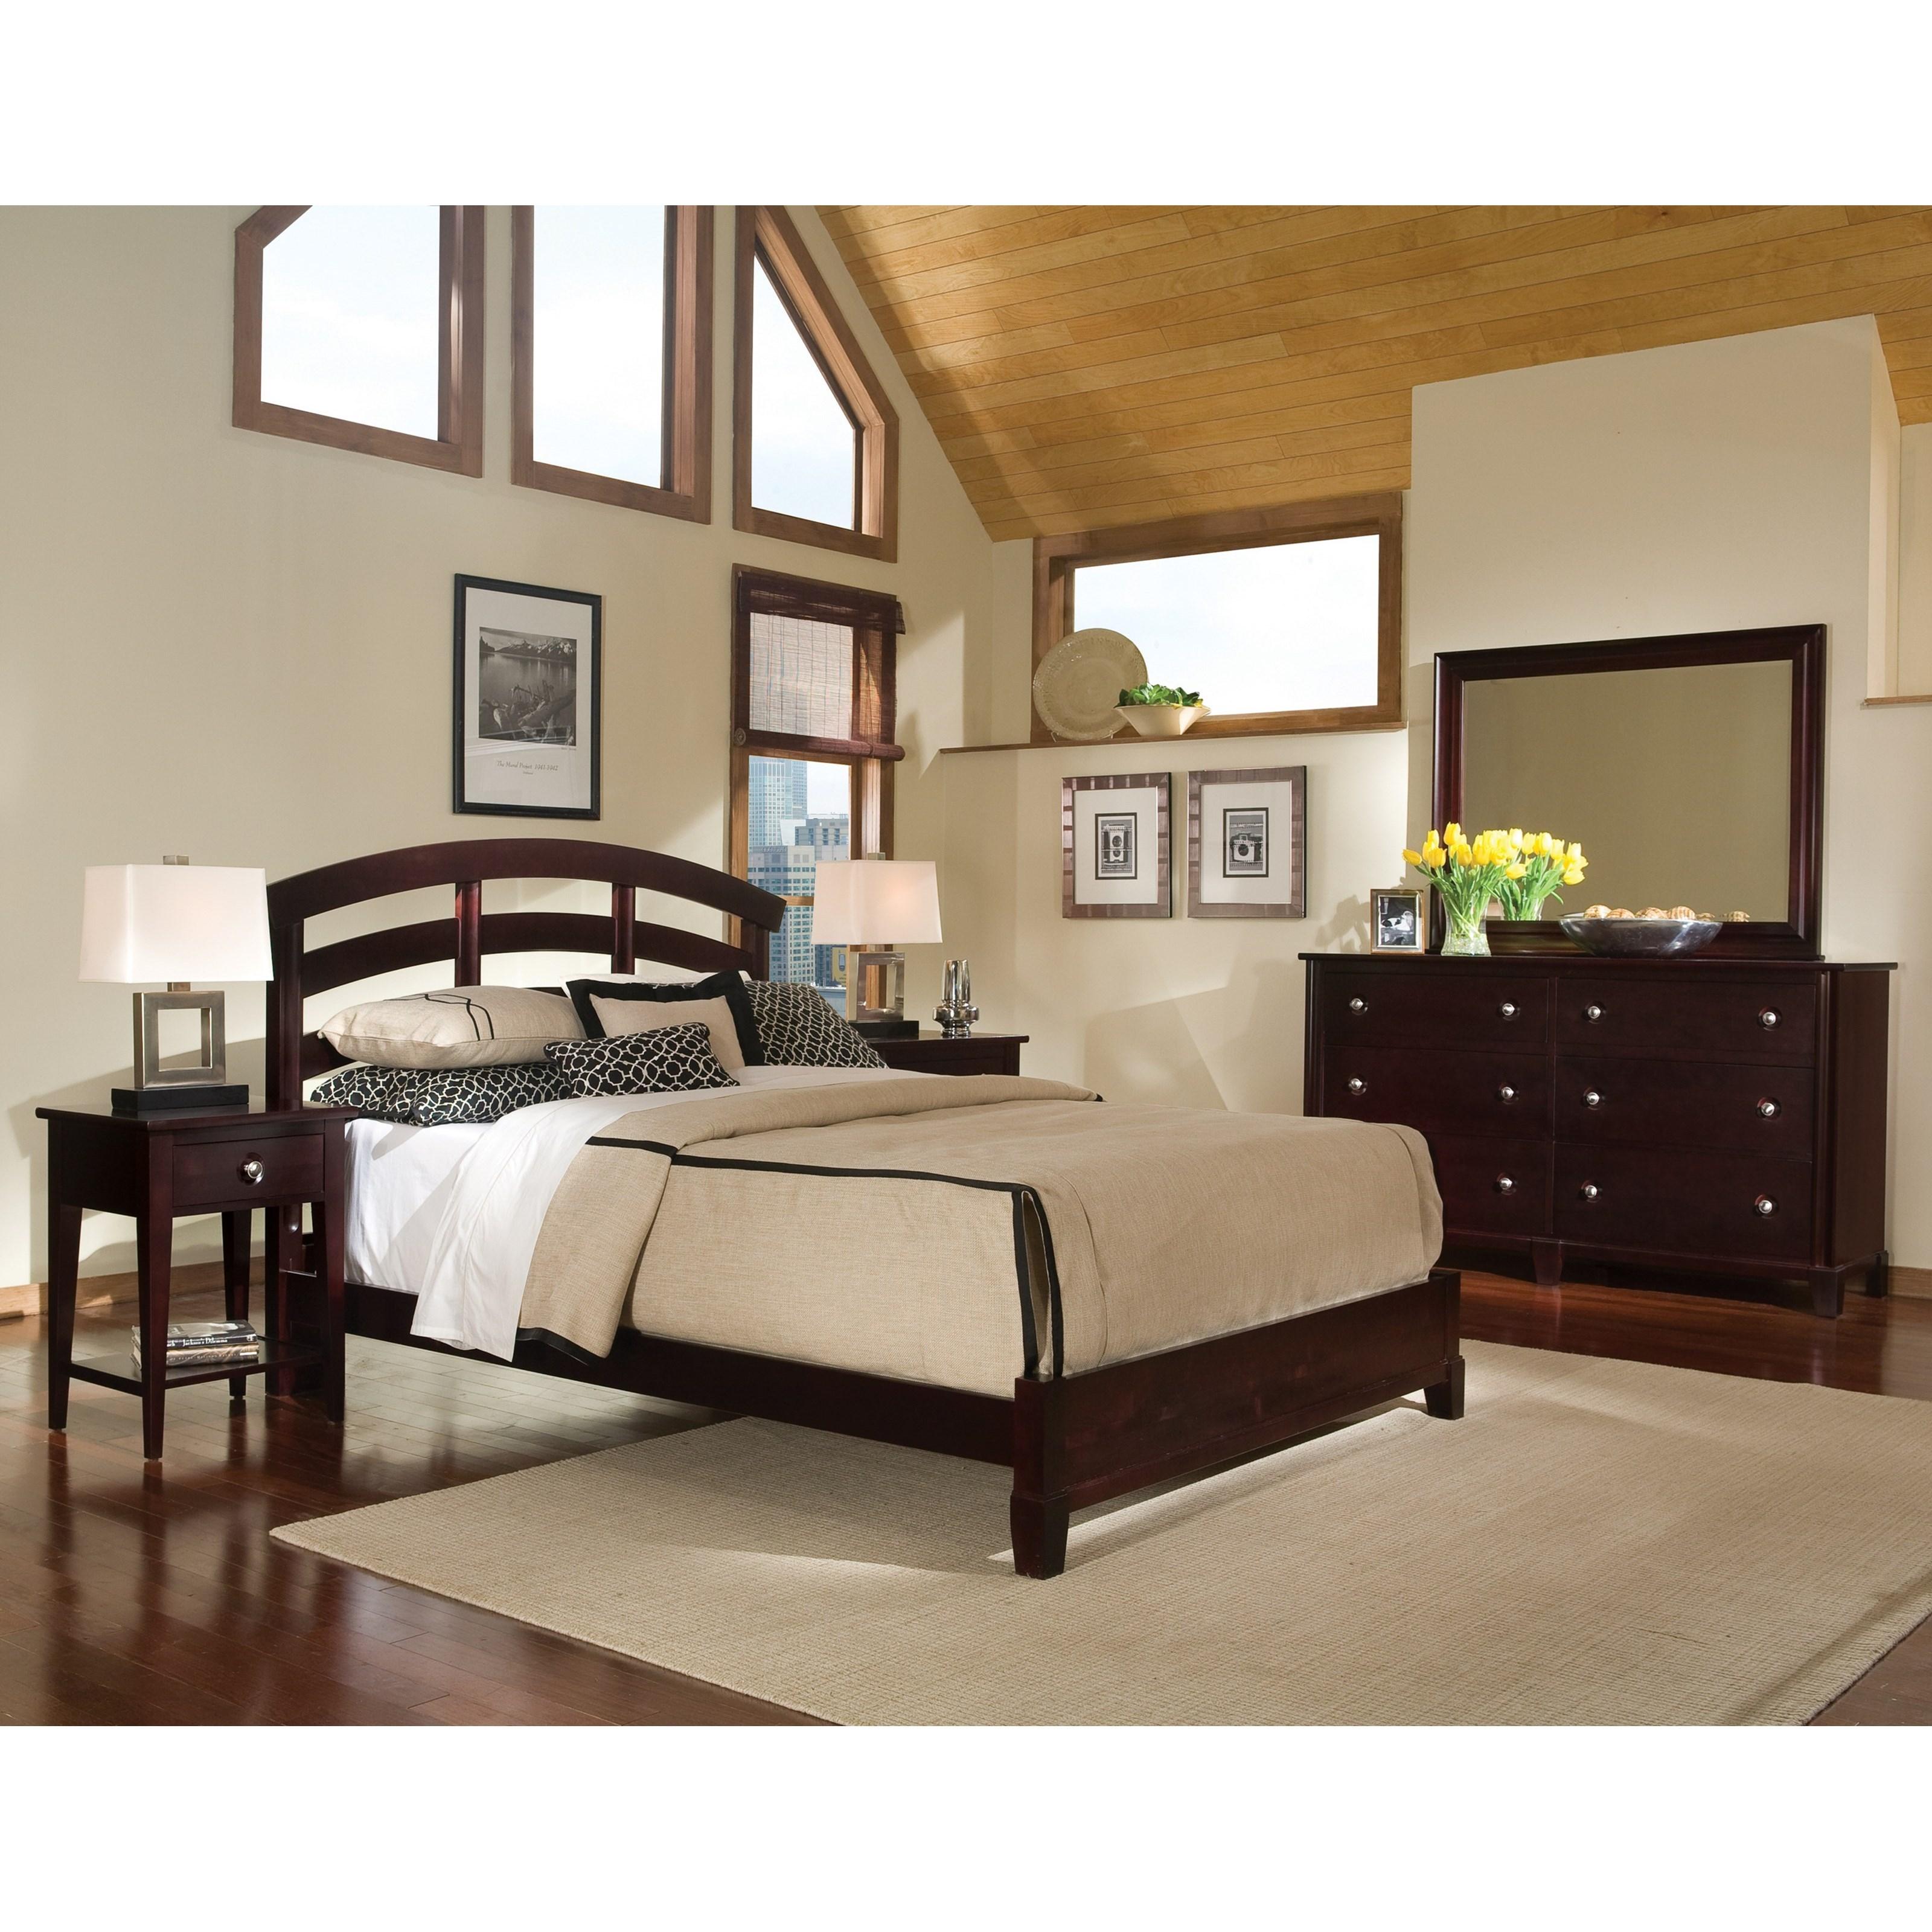 Manhattan  Queen Bedroom Group by Durham at Stoney Creek Furniture